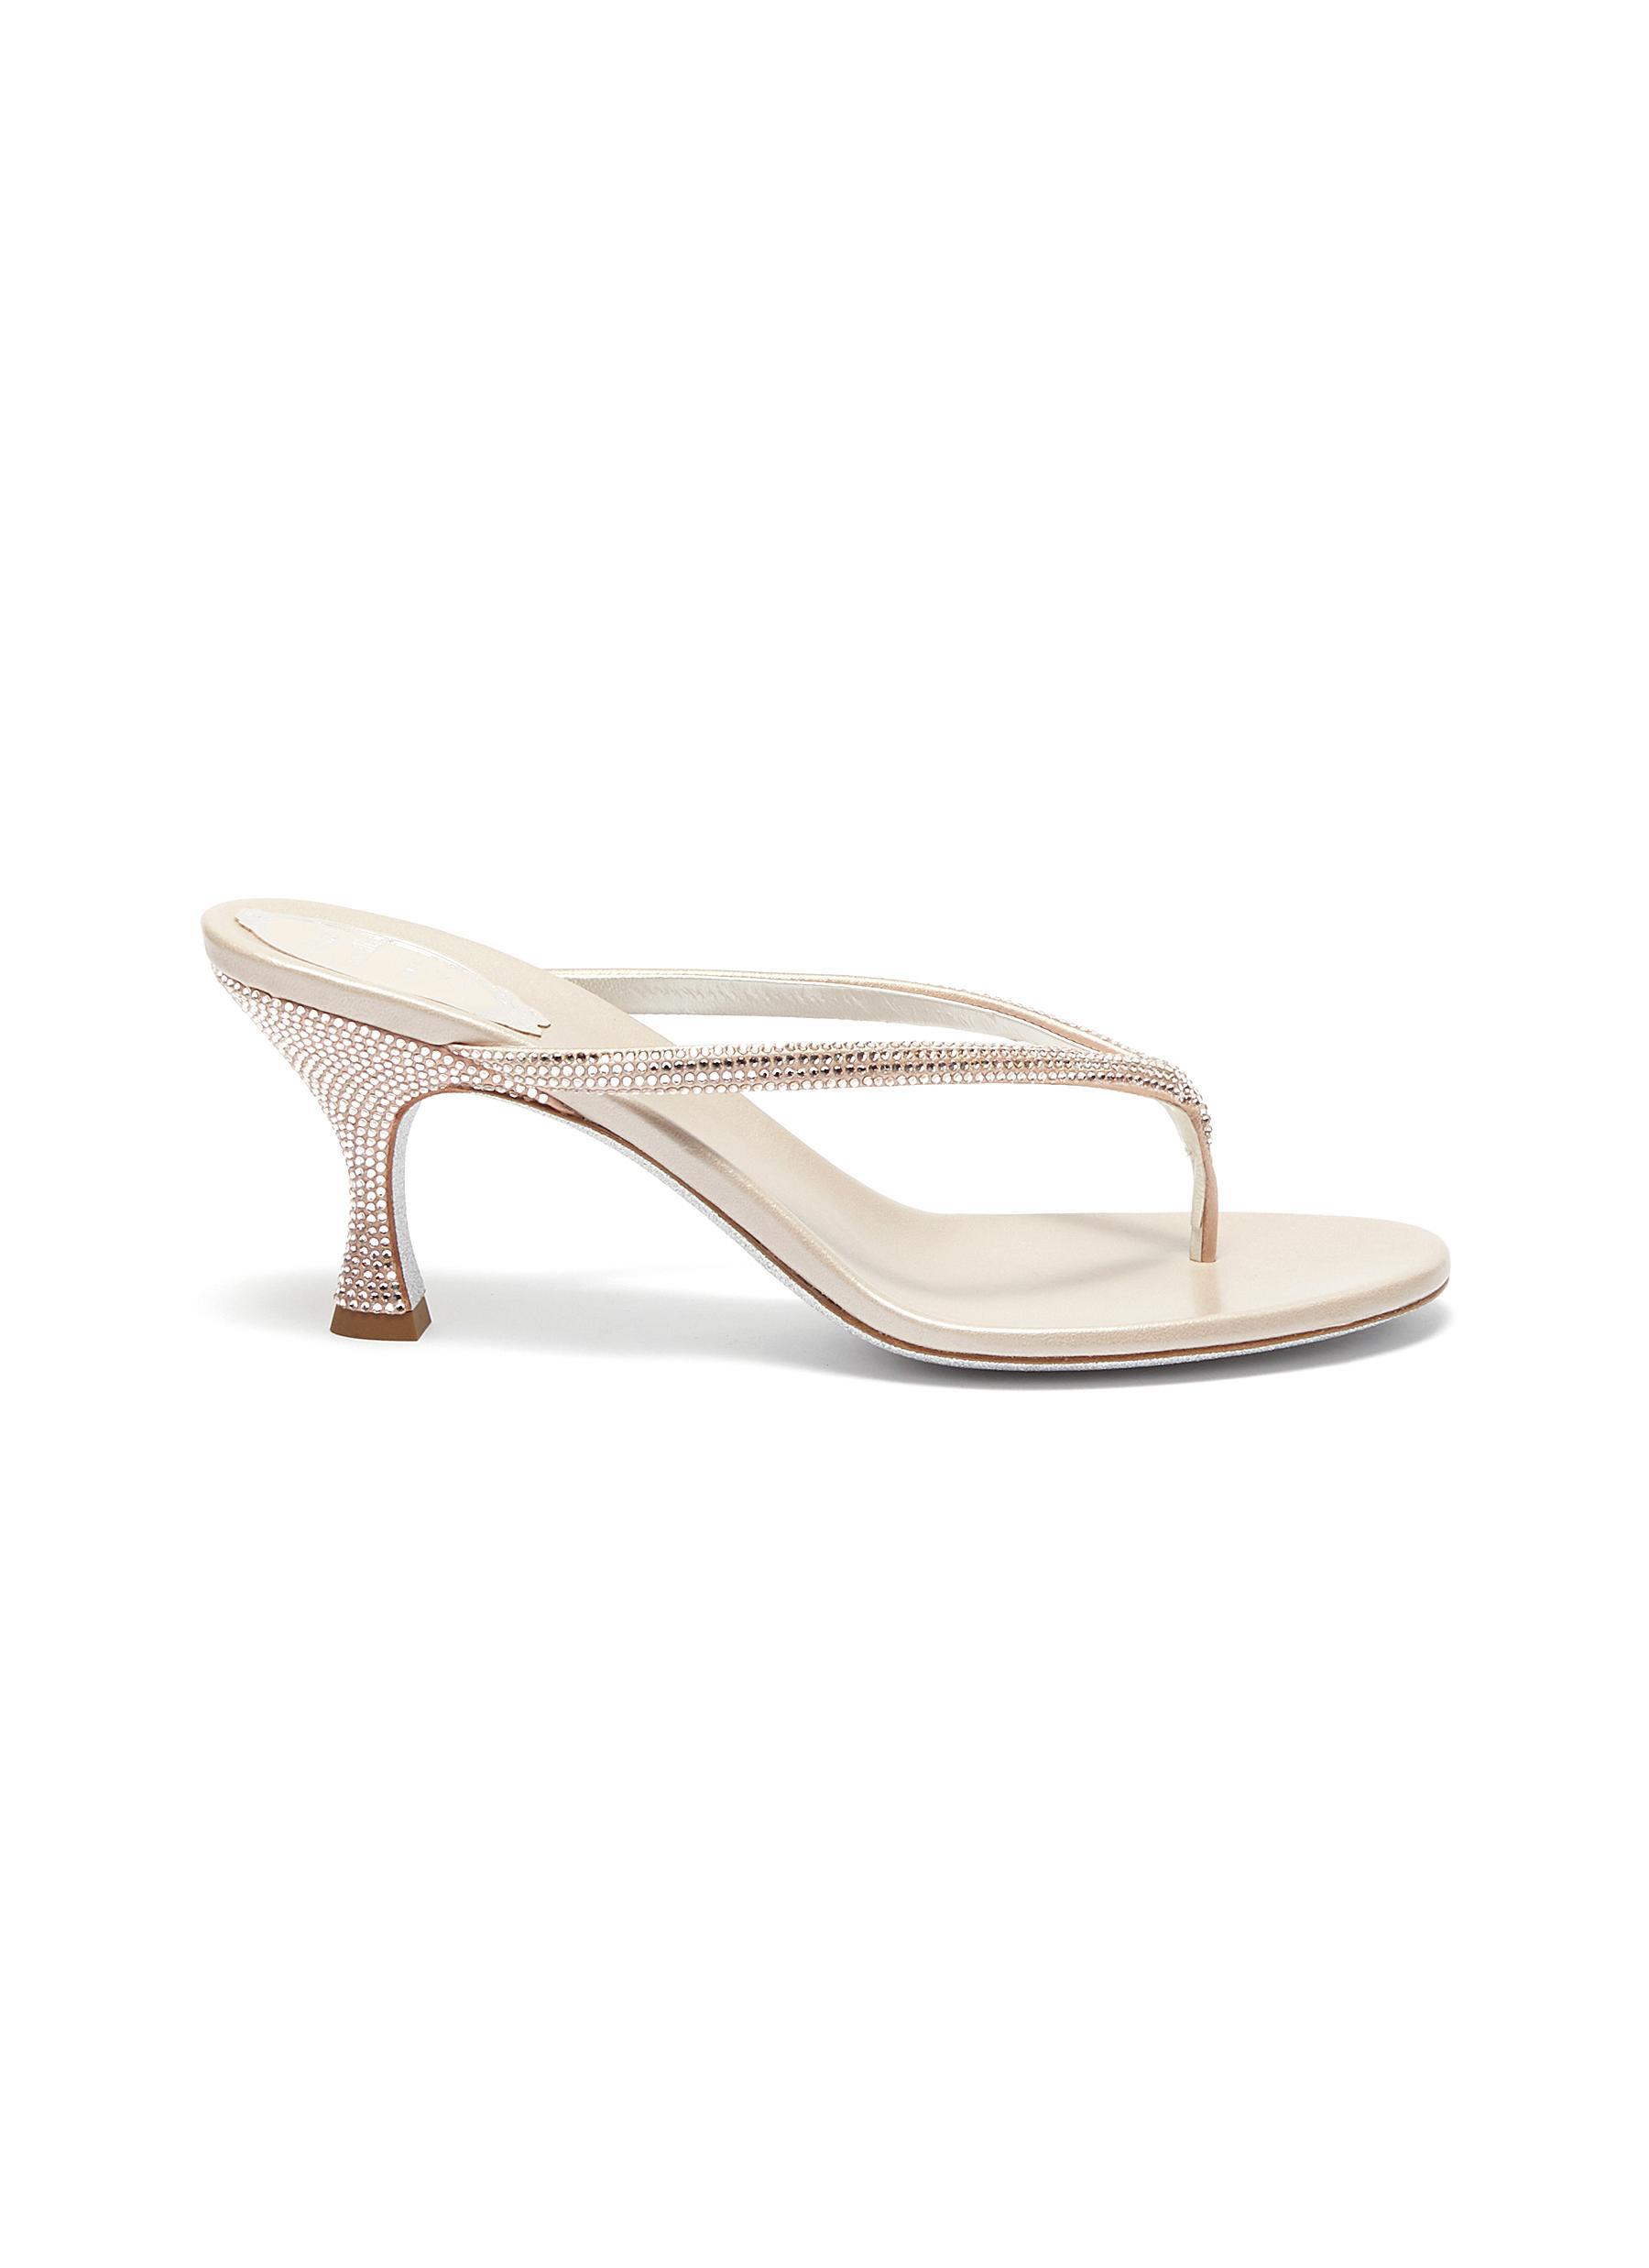 René Caovilla Mid Heels Crystal embellished strap thong sandal